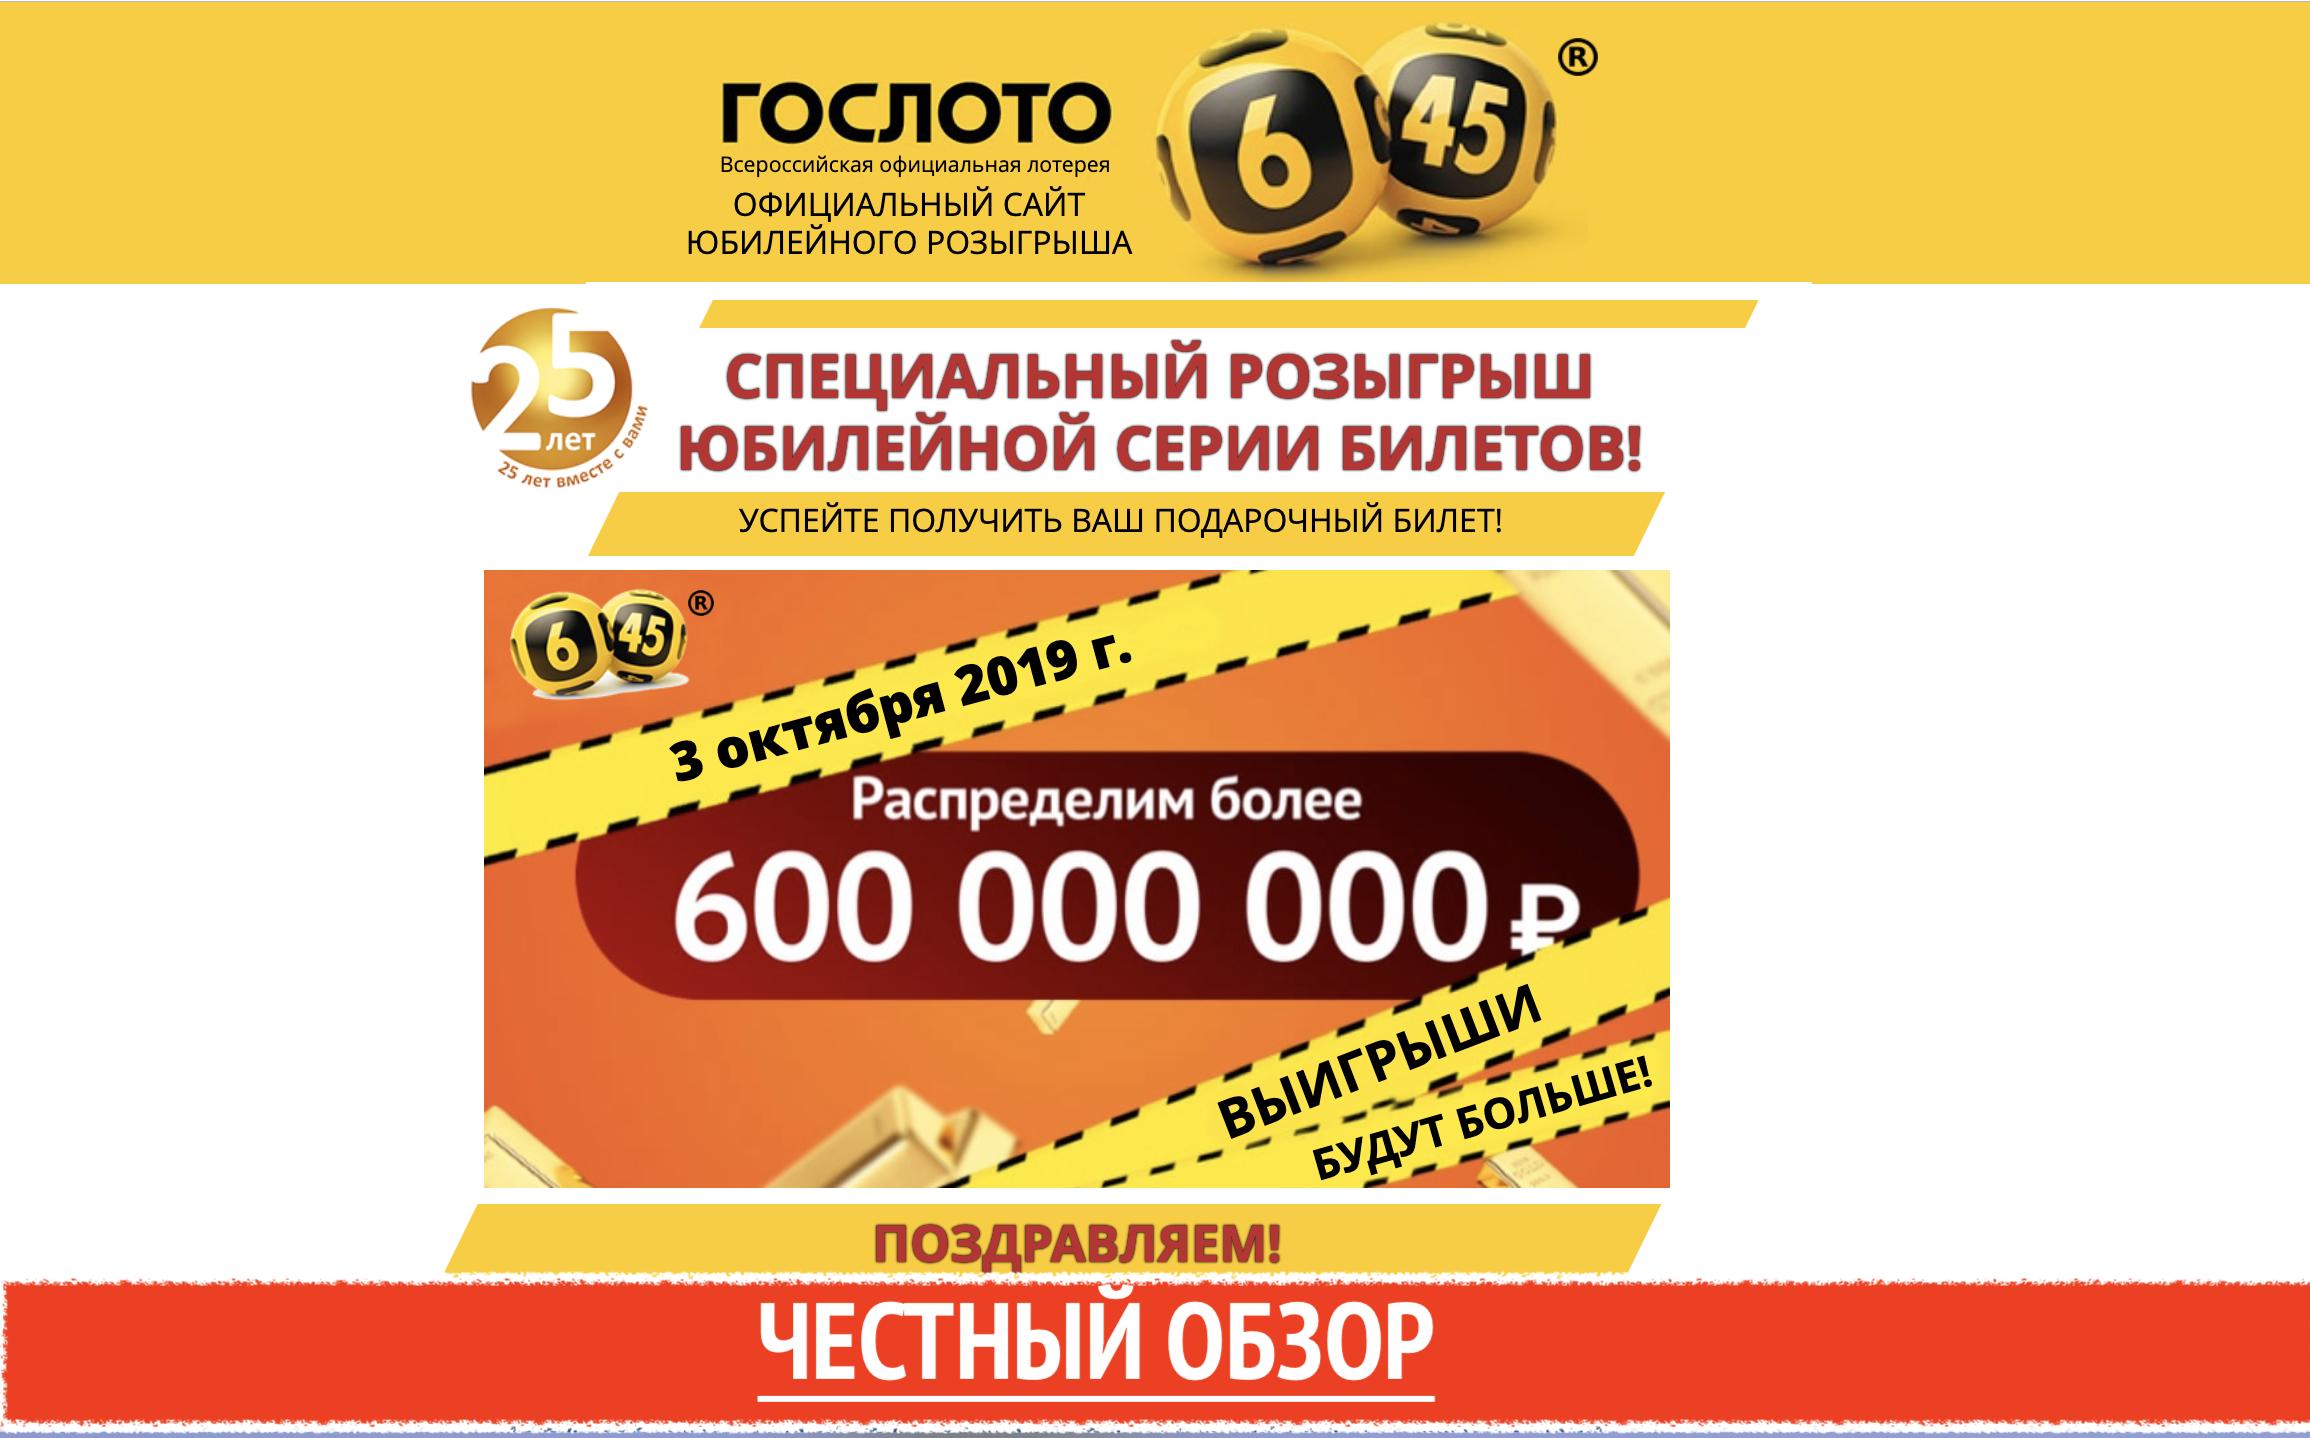 Loterie europejskie: euromilionów, euro, lotto wikingów